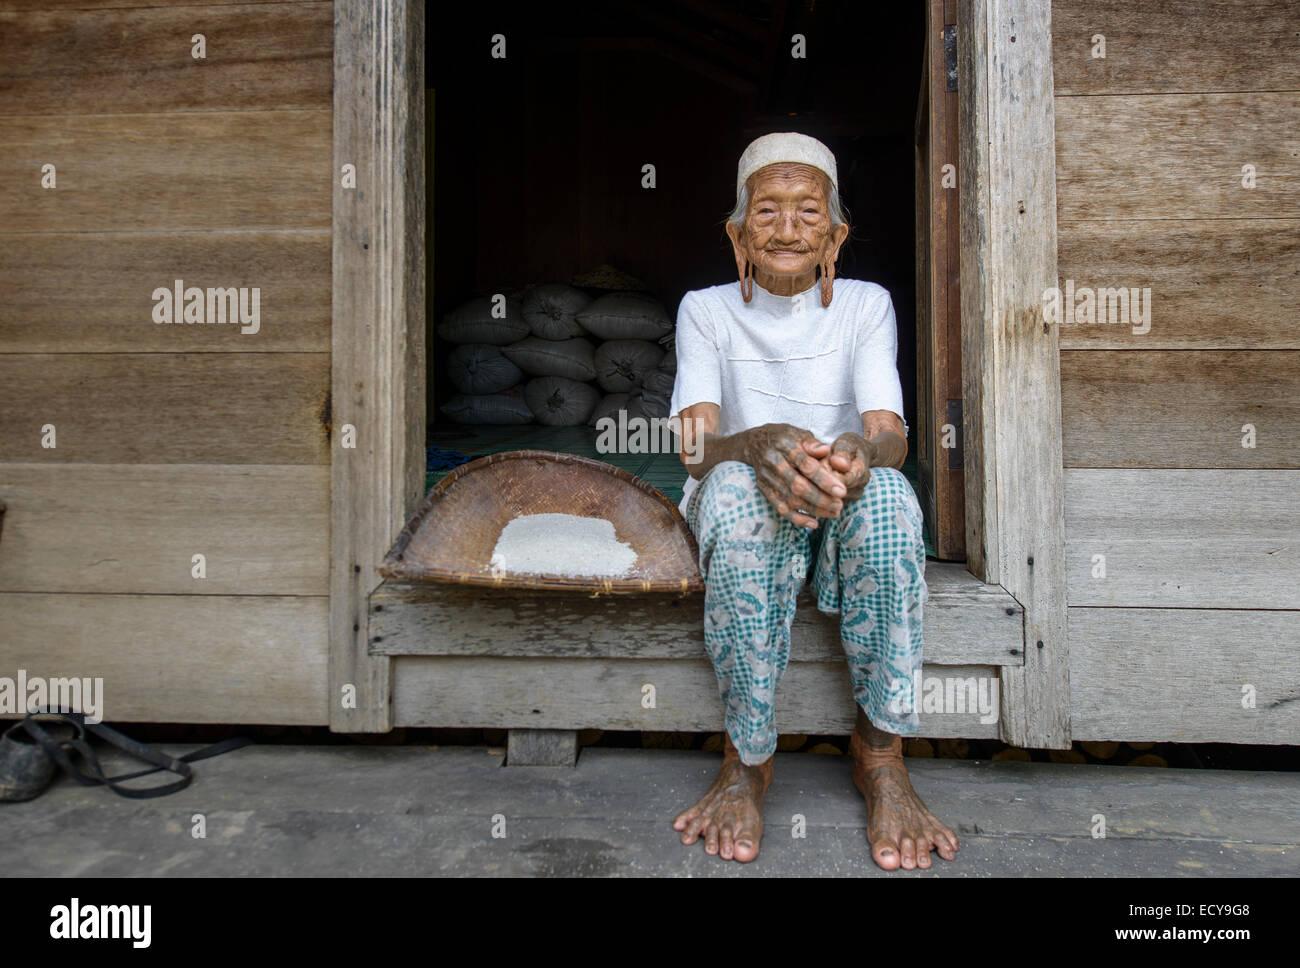 Dayak woman, Kalimantan, Borneo, Indonesia - Stock Image